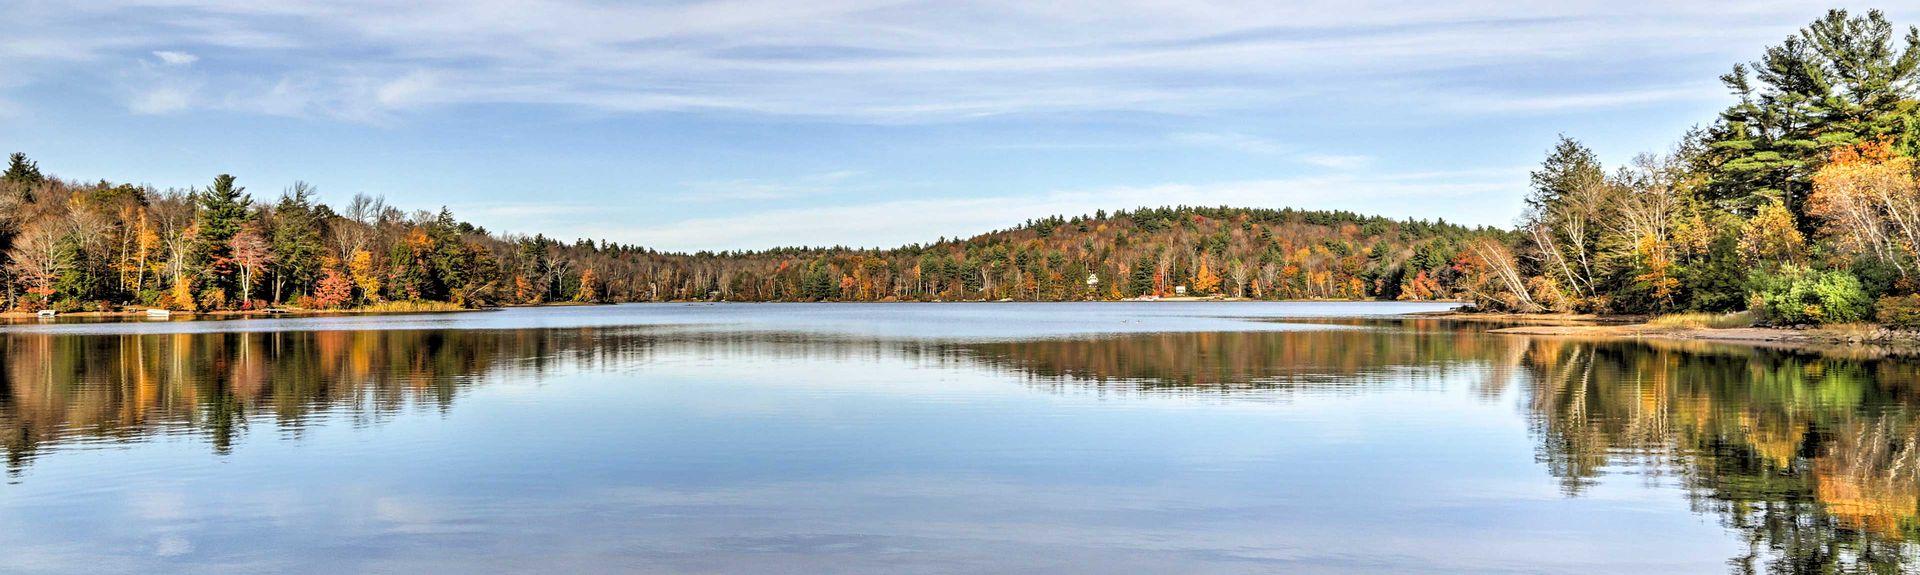 Southwick, Massachusetts, Verenigde Staten